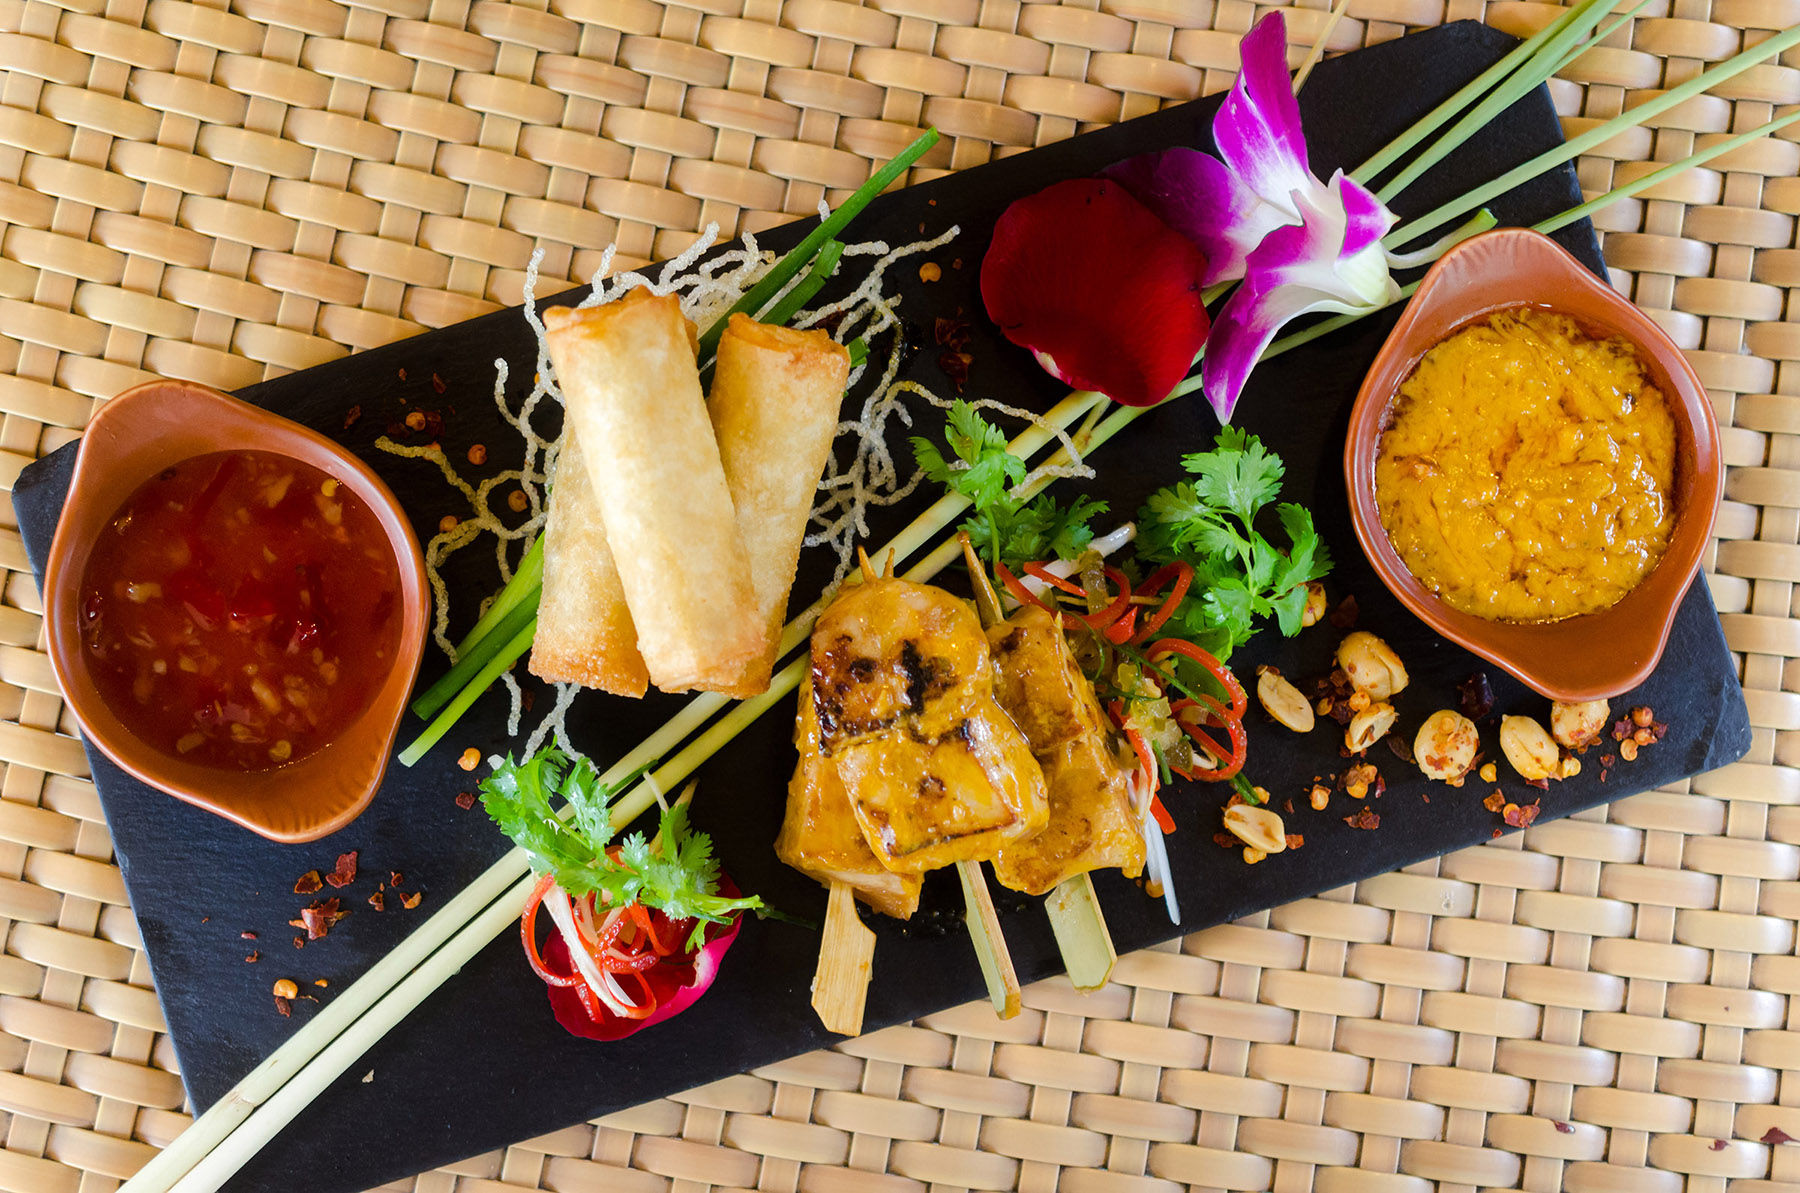 Edsa Shangri-La, Manila's executive chef, Scott Brands prepared Chicken satay skewers with peanut sa